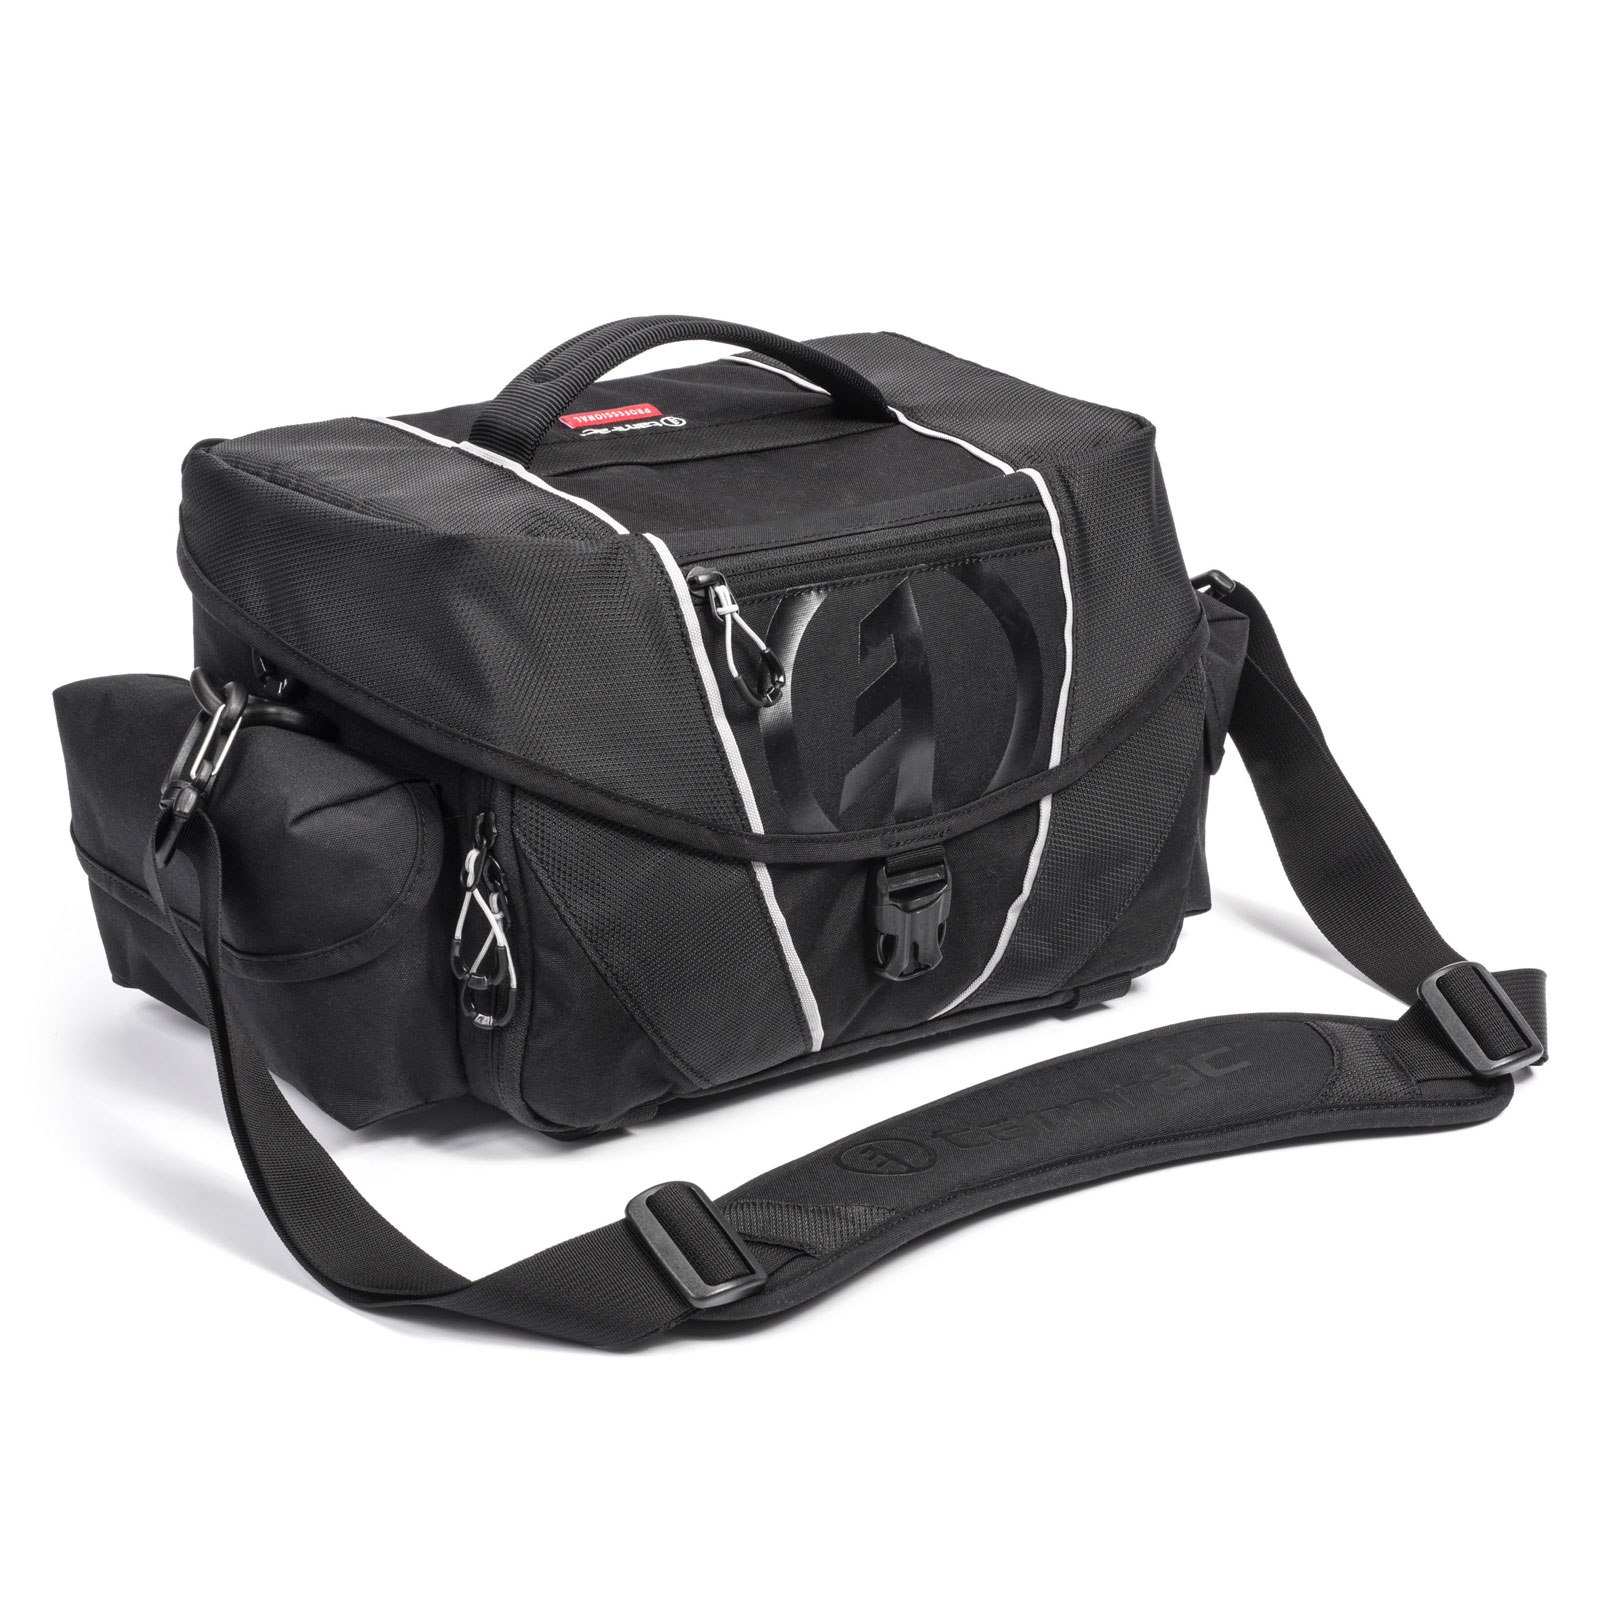 Tamrac Stratus 10 Camera Shoulder Bag Carrier Photography...